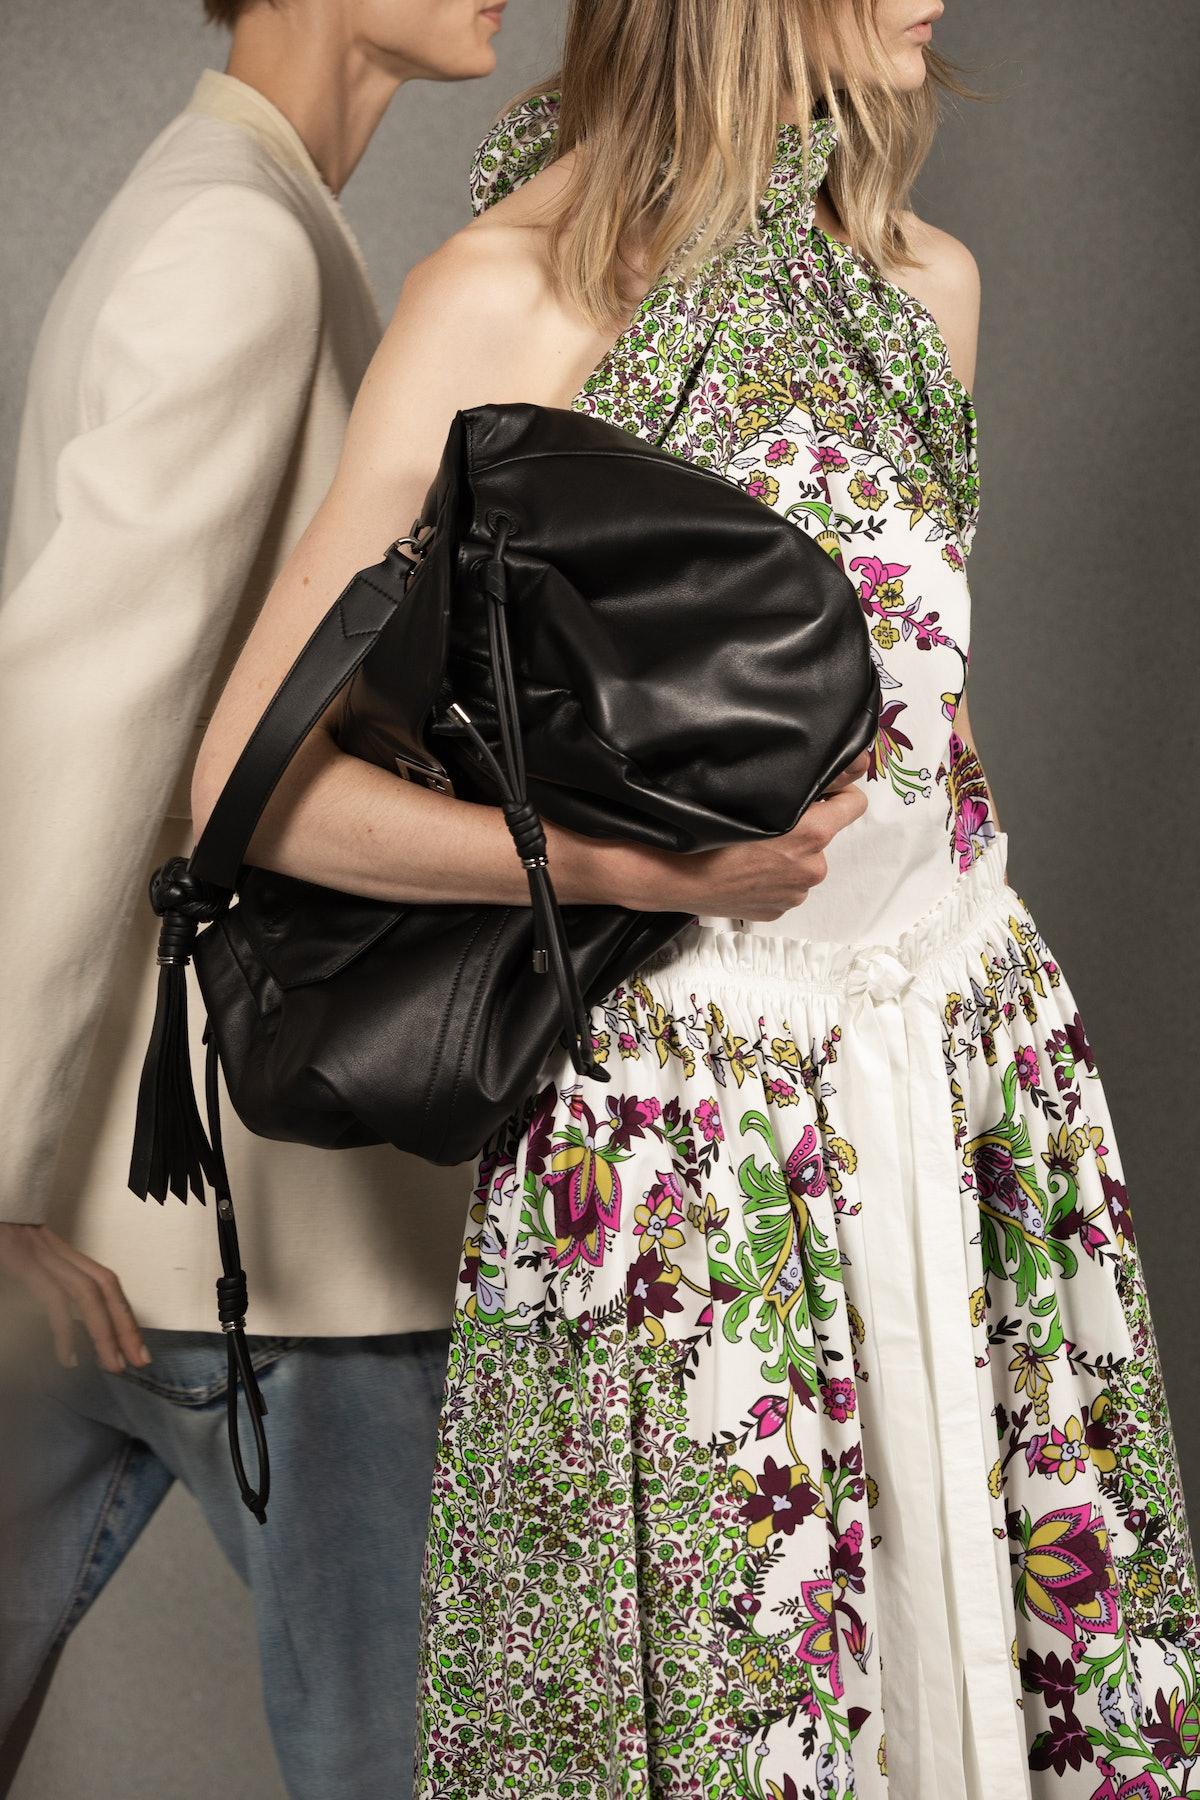 Serichai_Givenchy-113.jpg